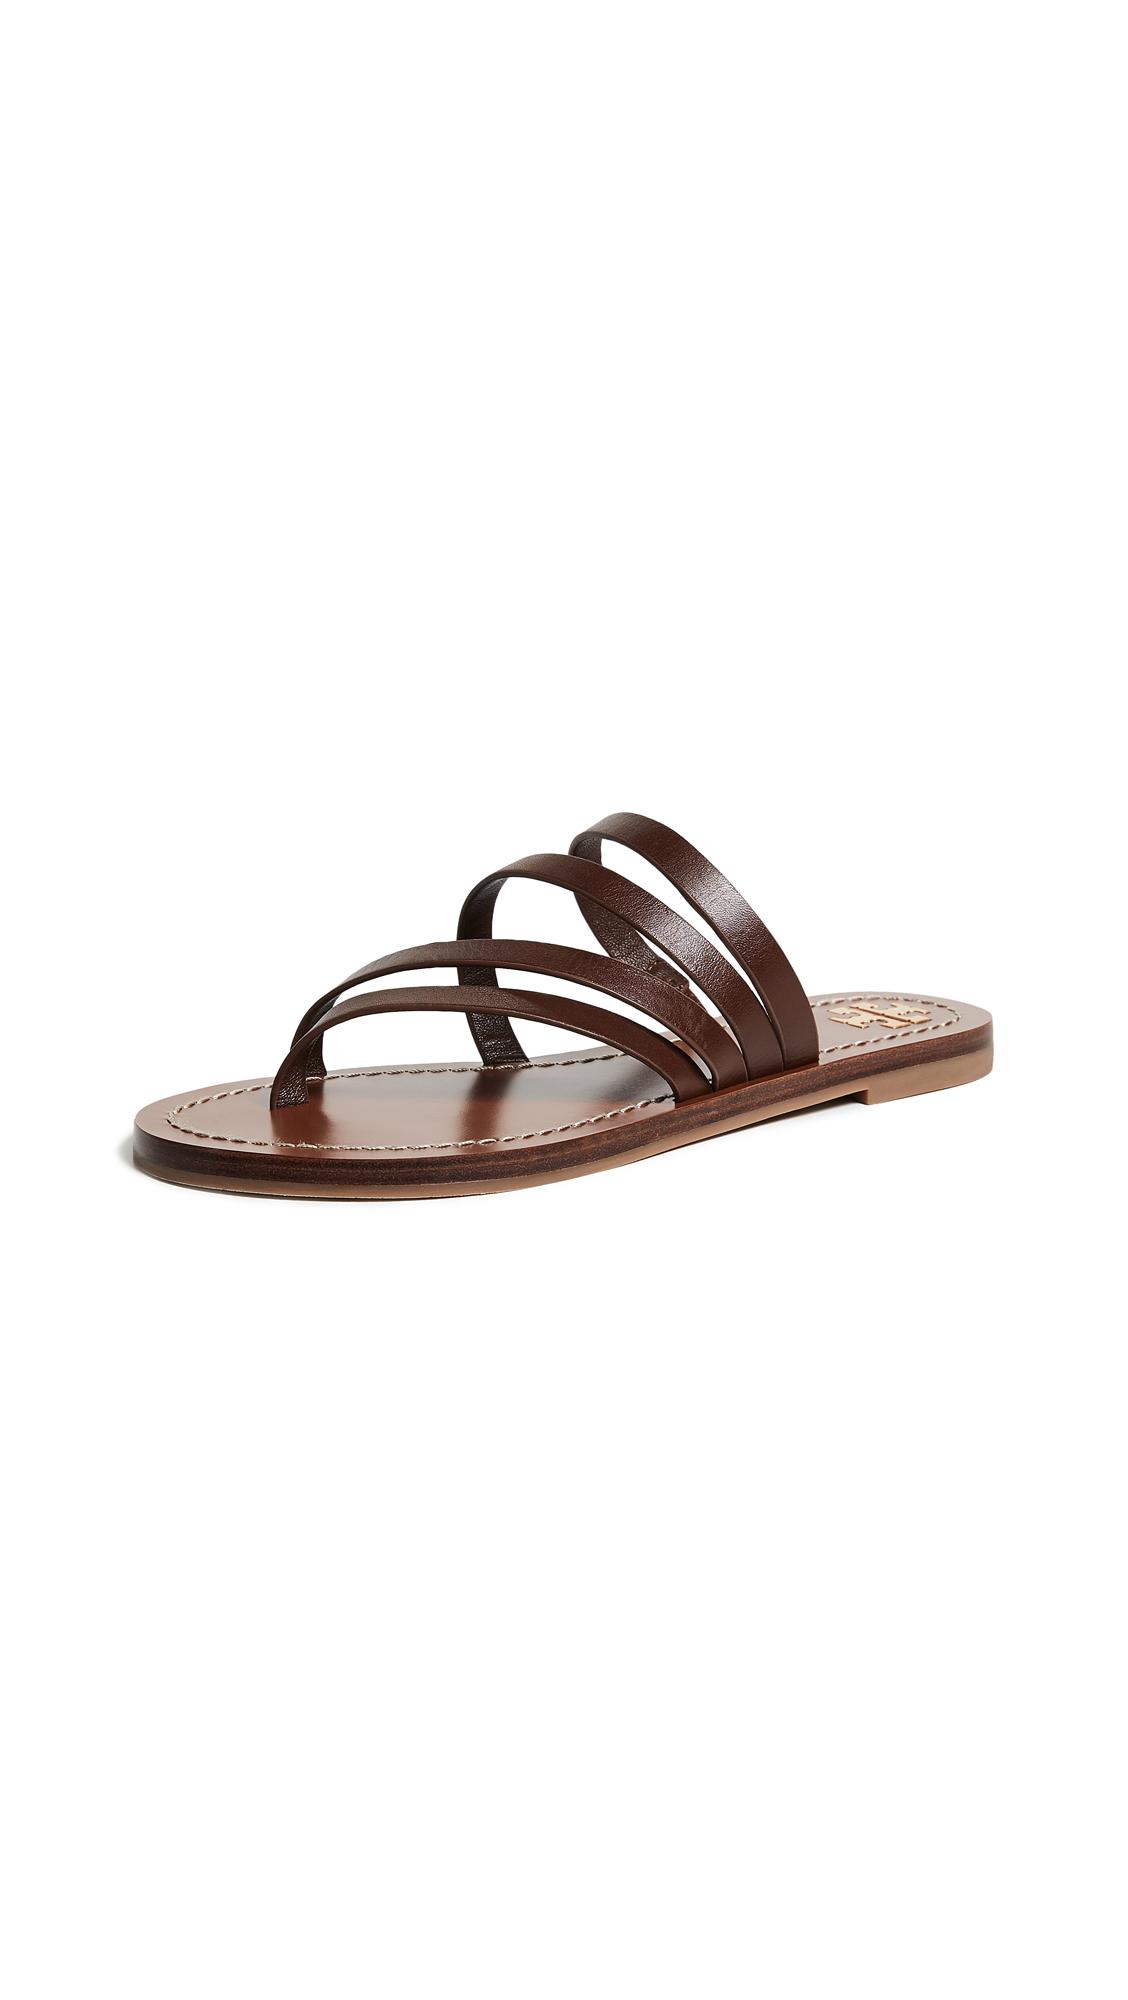 Tory Burch Patos Flat Sandals - Americano